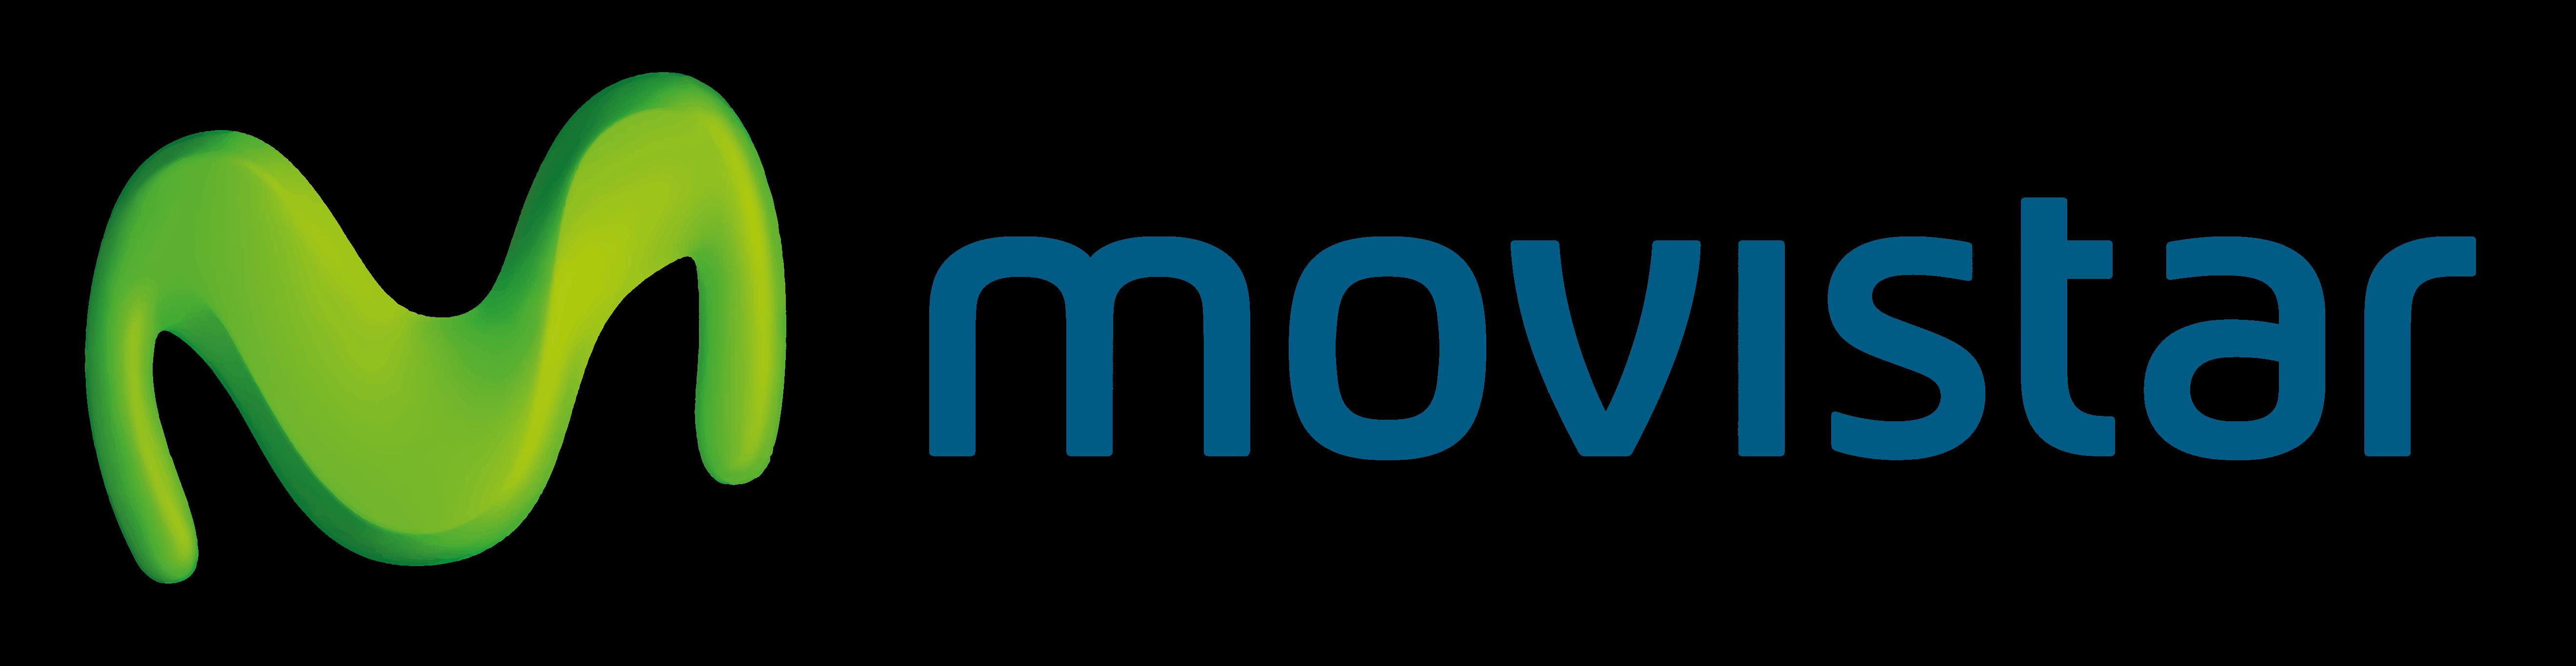 Movistar logo, logotipo.